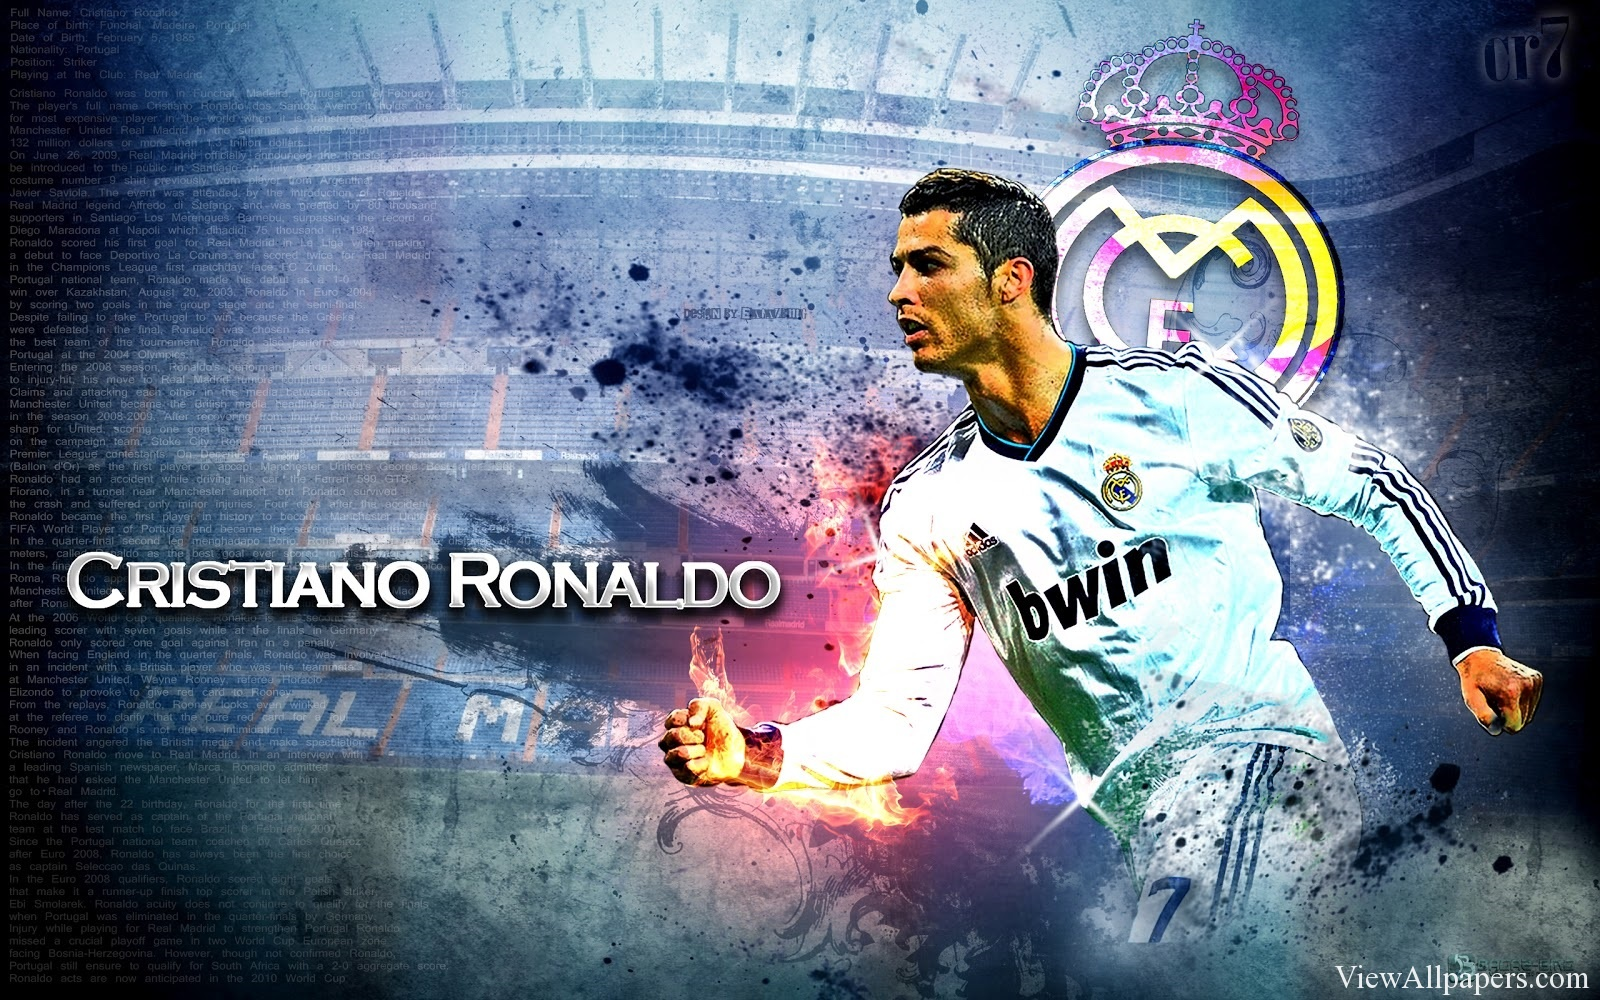 CR7 2014 Ronaldo Wallpaper High Resolution download this CR7 1600x1000